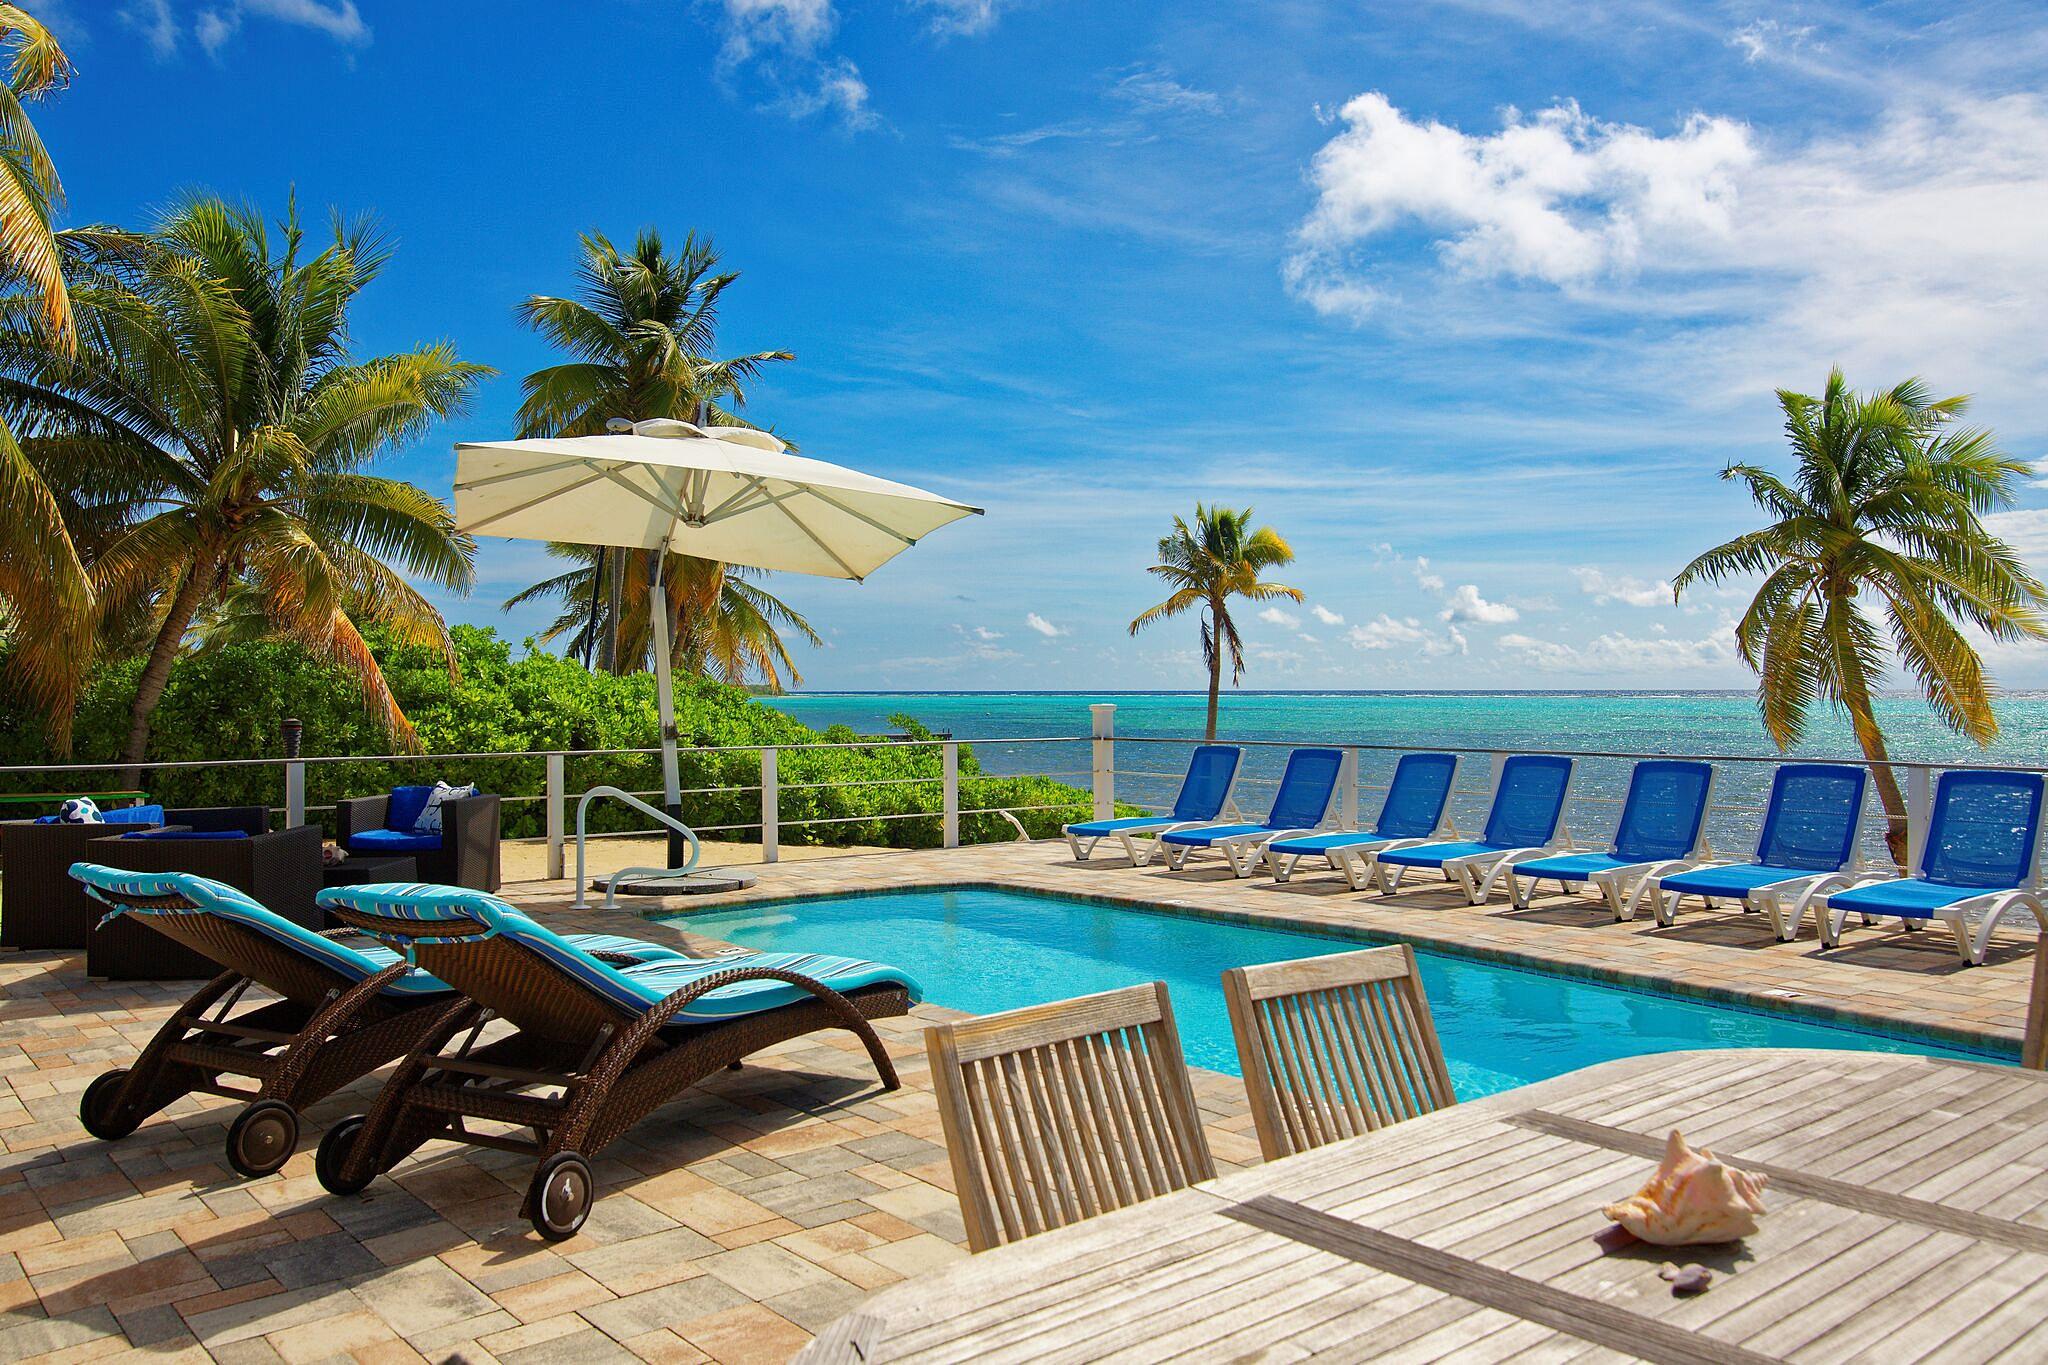 Cayman Island Beach Images